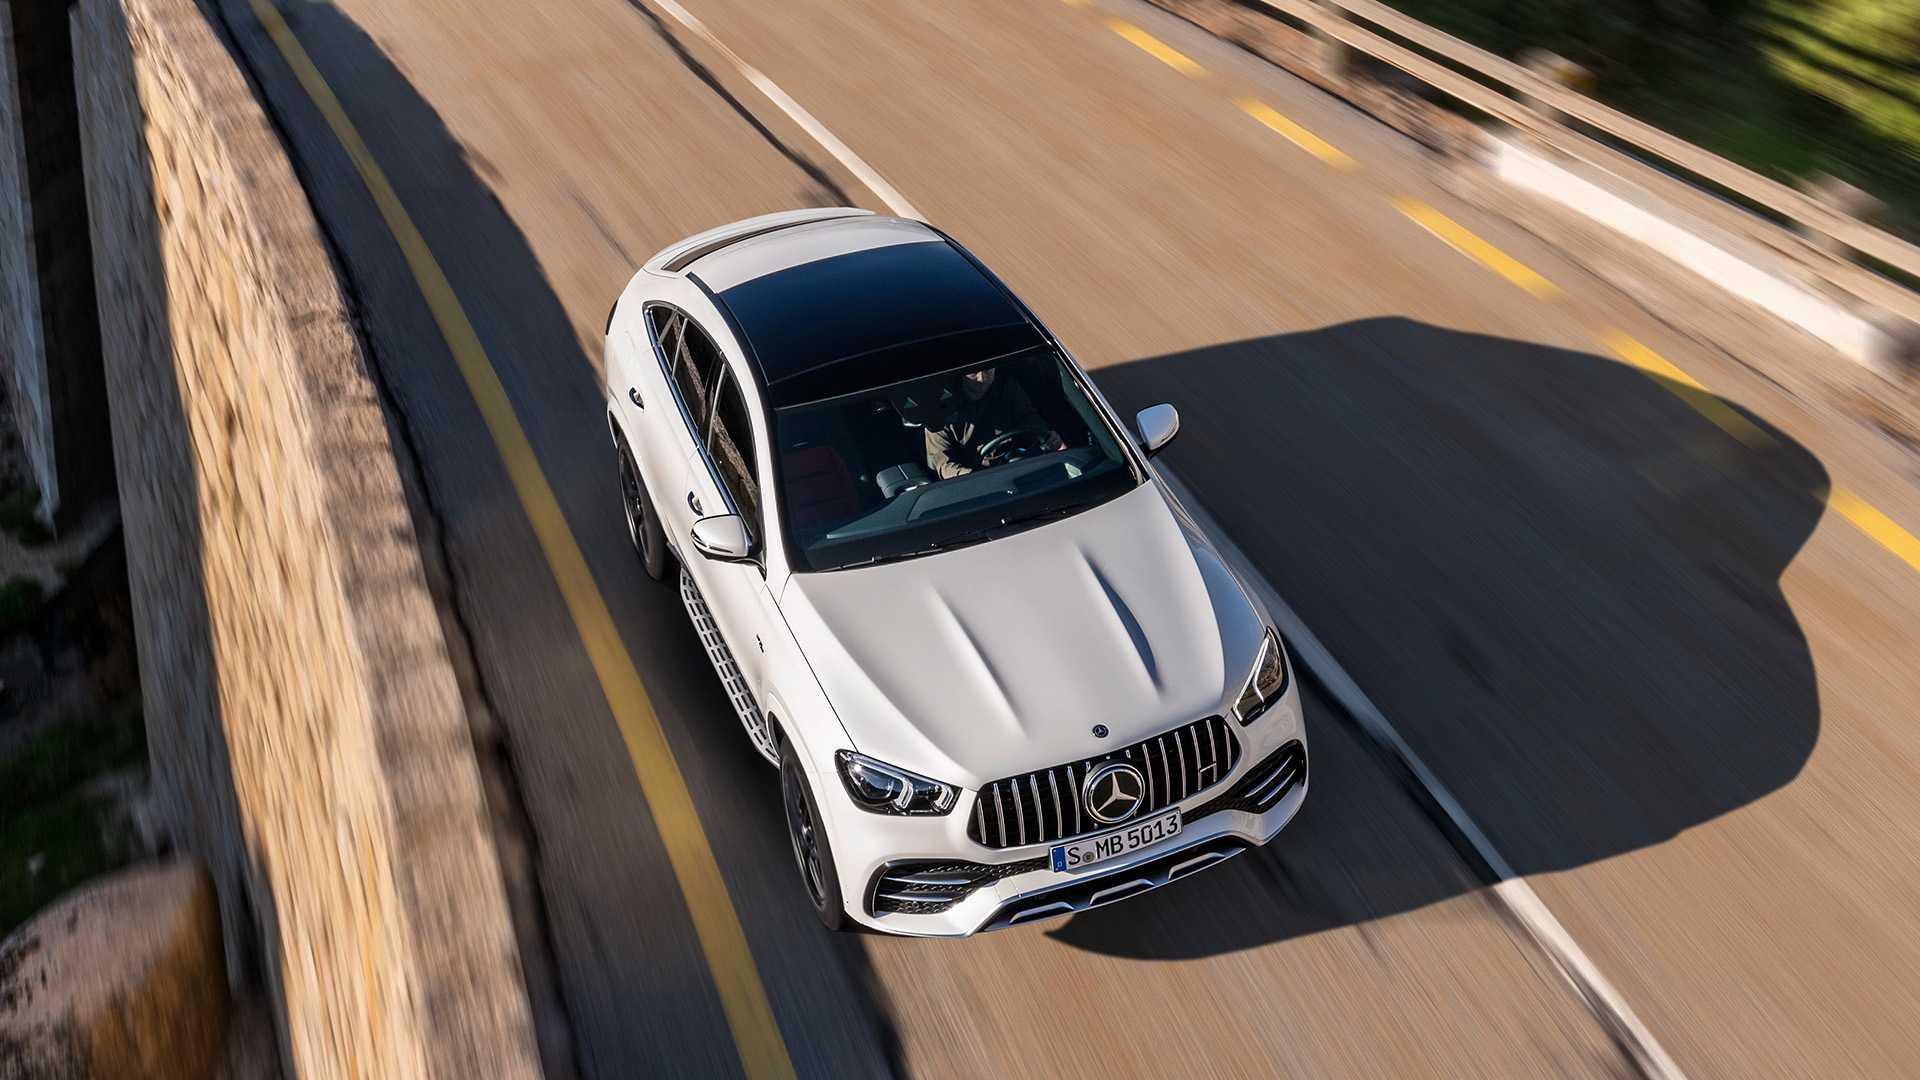 2021 Mercedes-AMG GLE 53 Coupe 4MATIC+ (Color: Designo Diamond White Bright) Top Wallpapers (9)